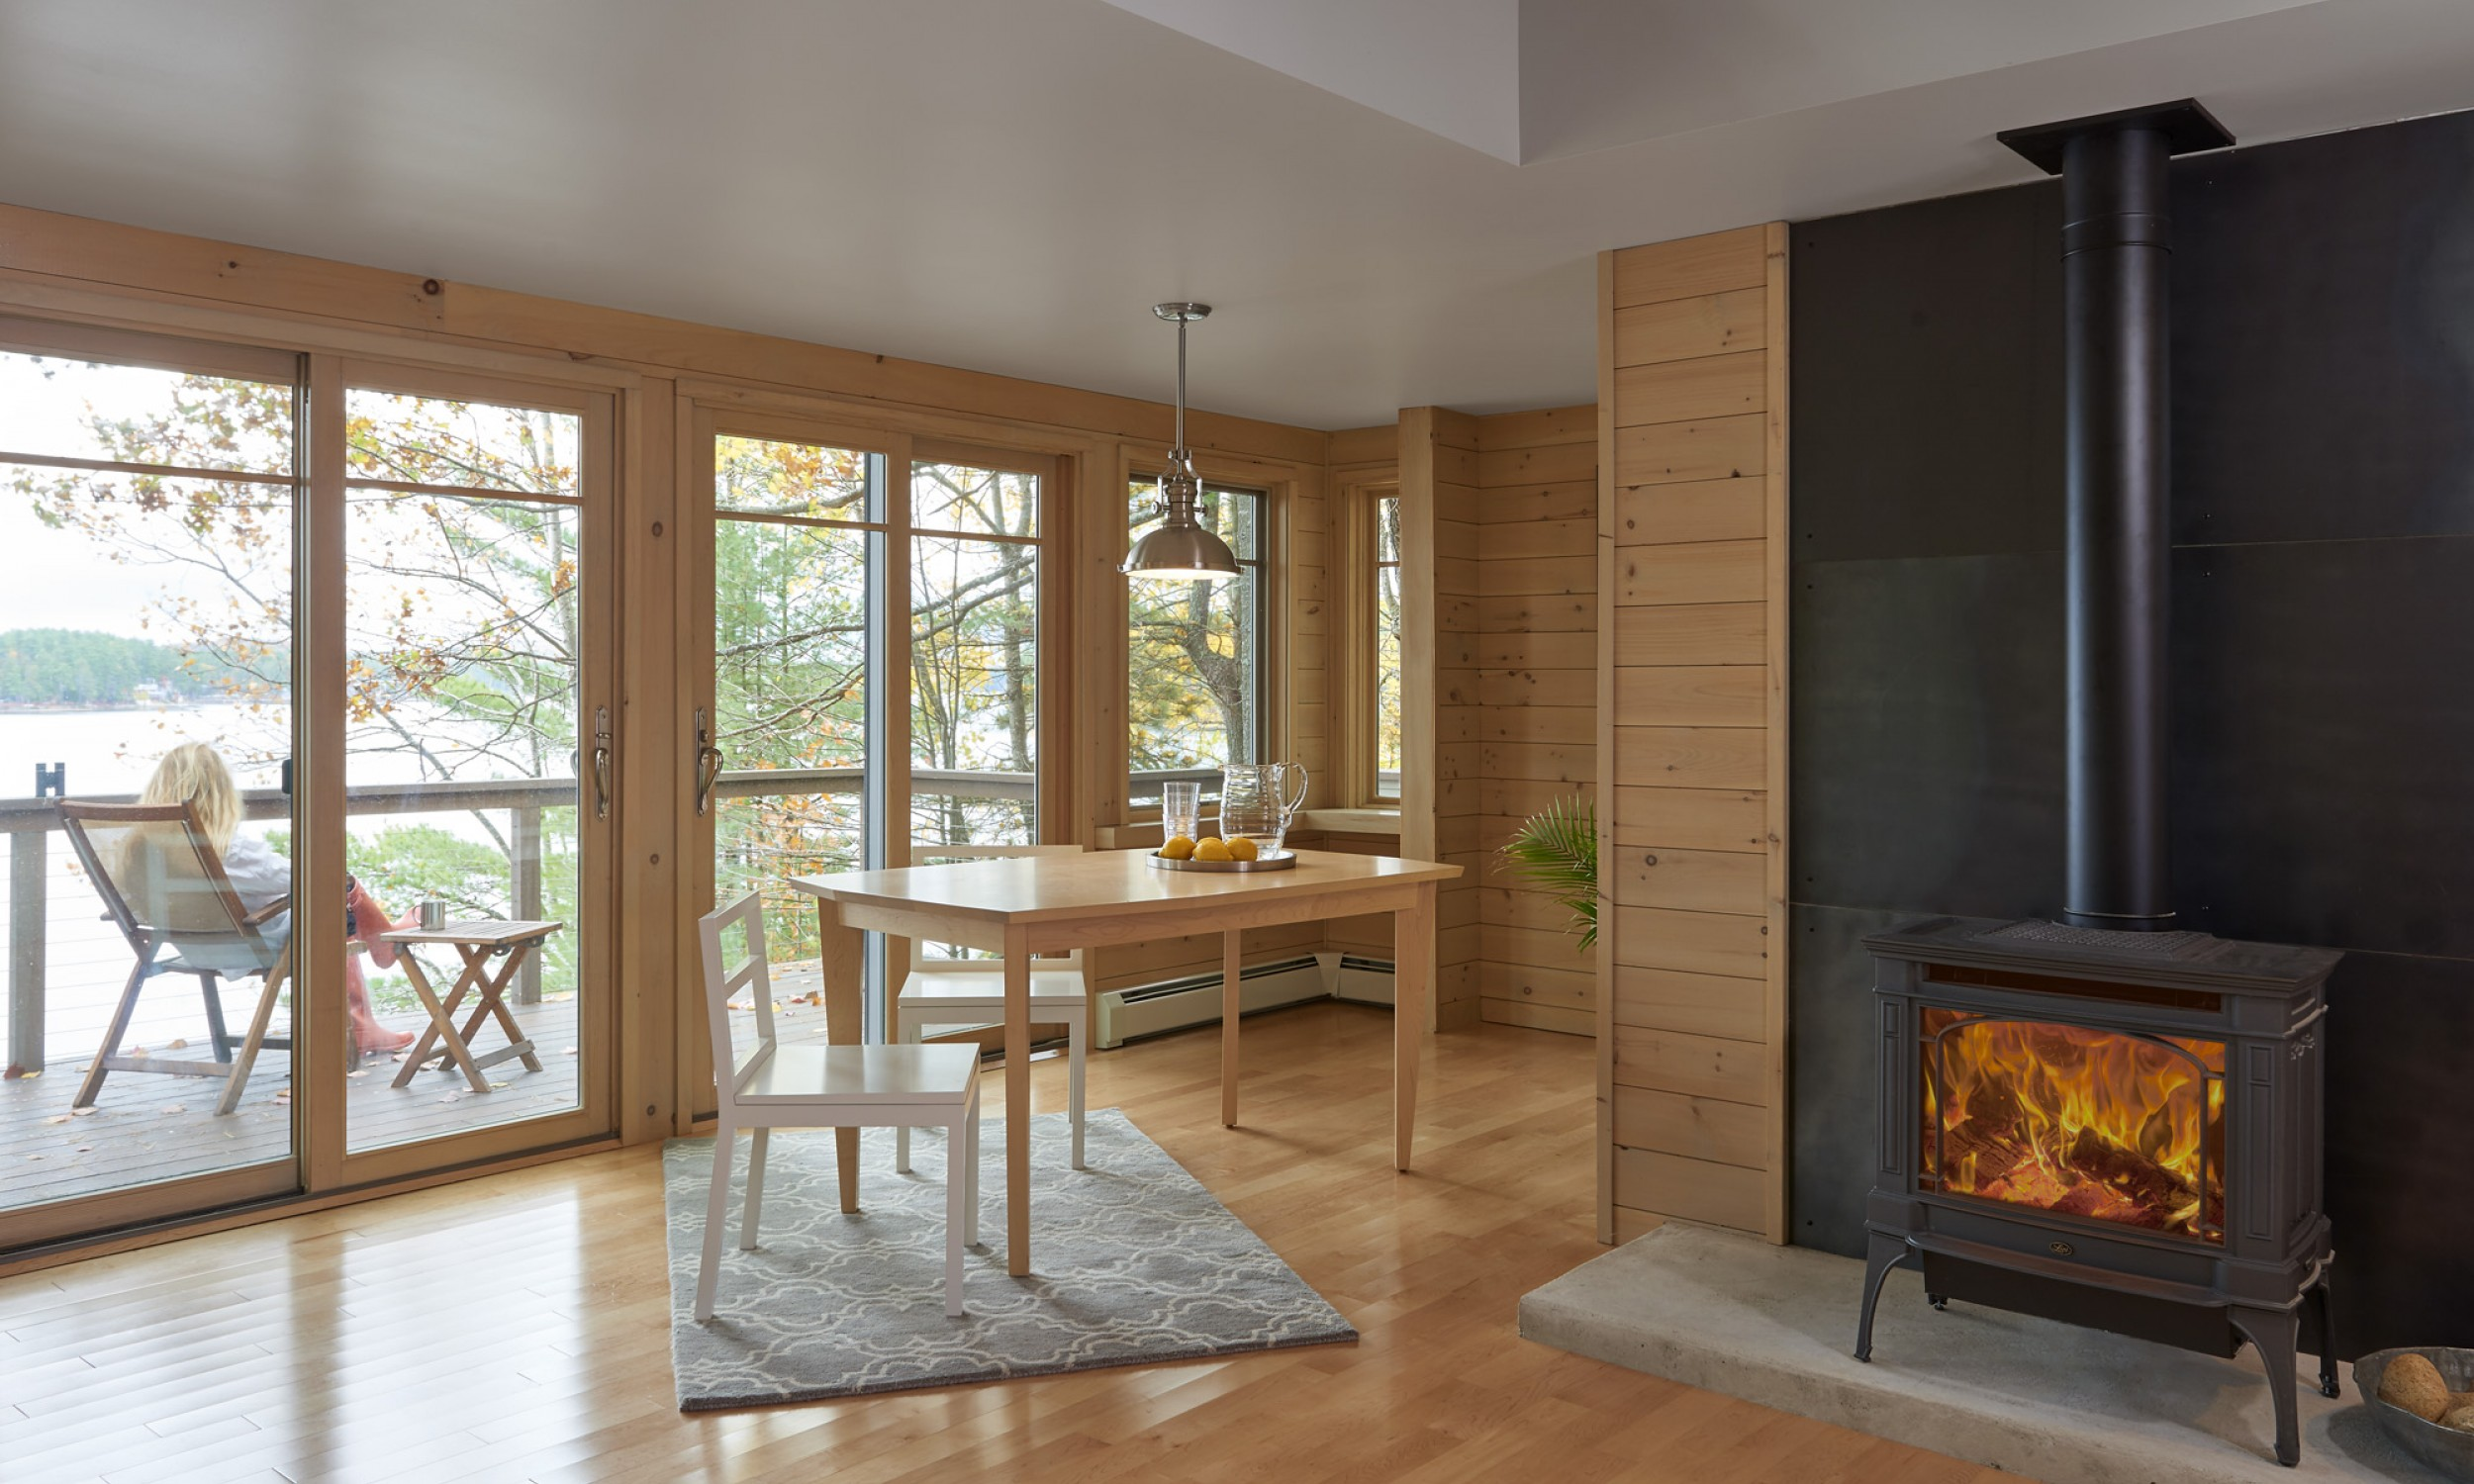 Gas stove, maple flooring, lake view, Maine Architect, Concrete hearth